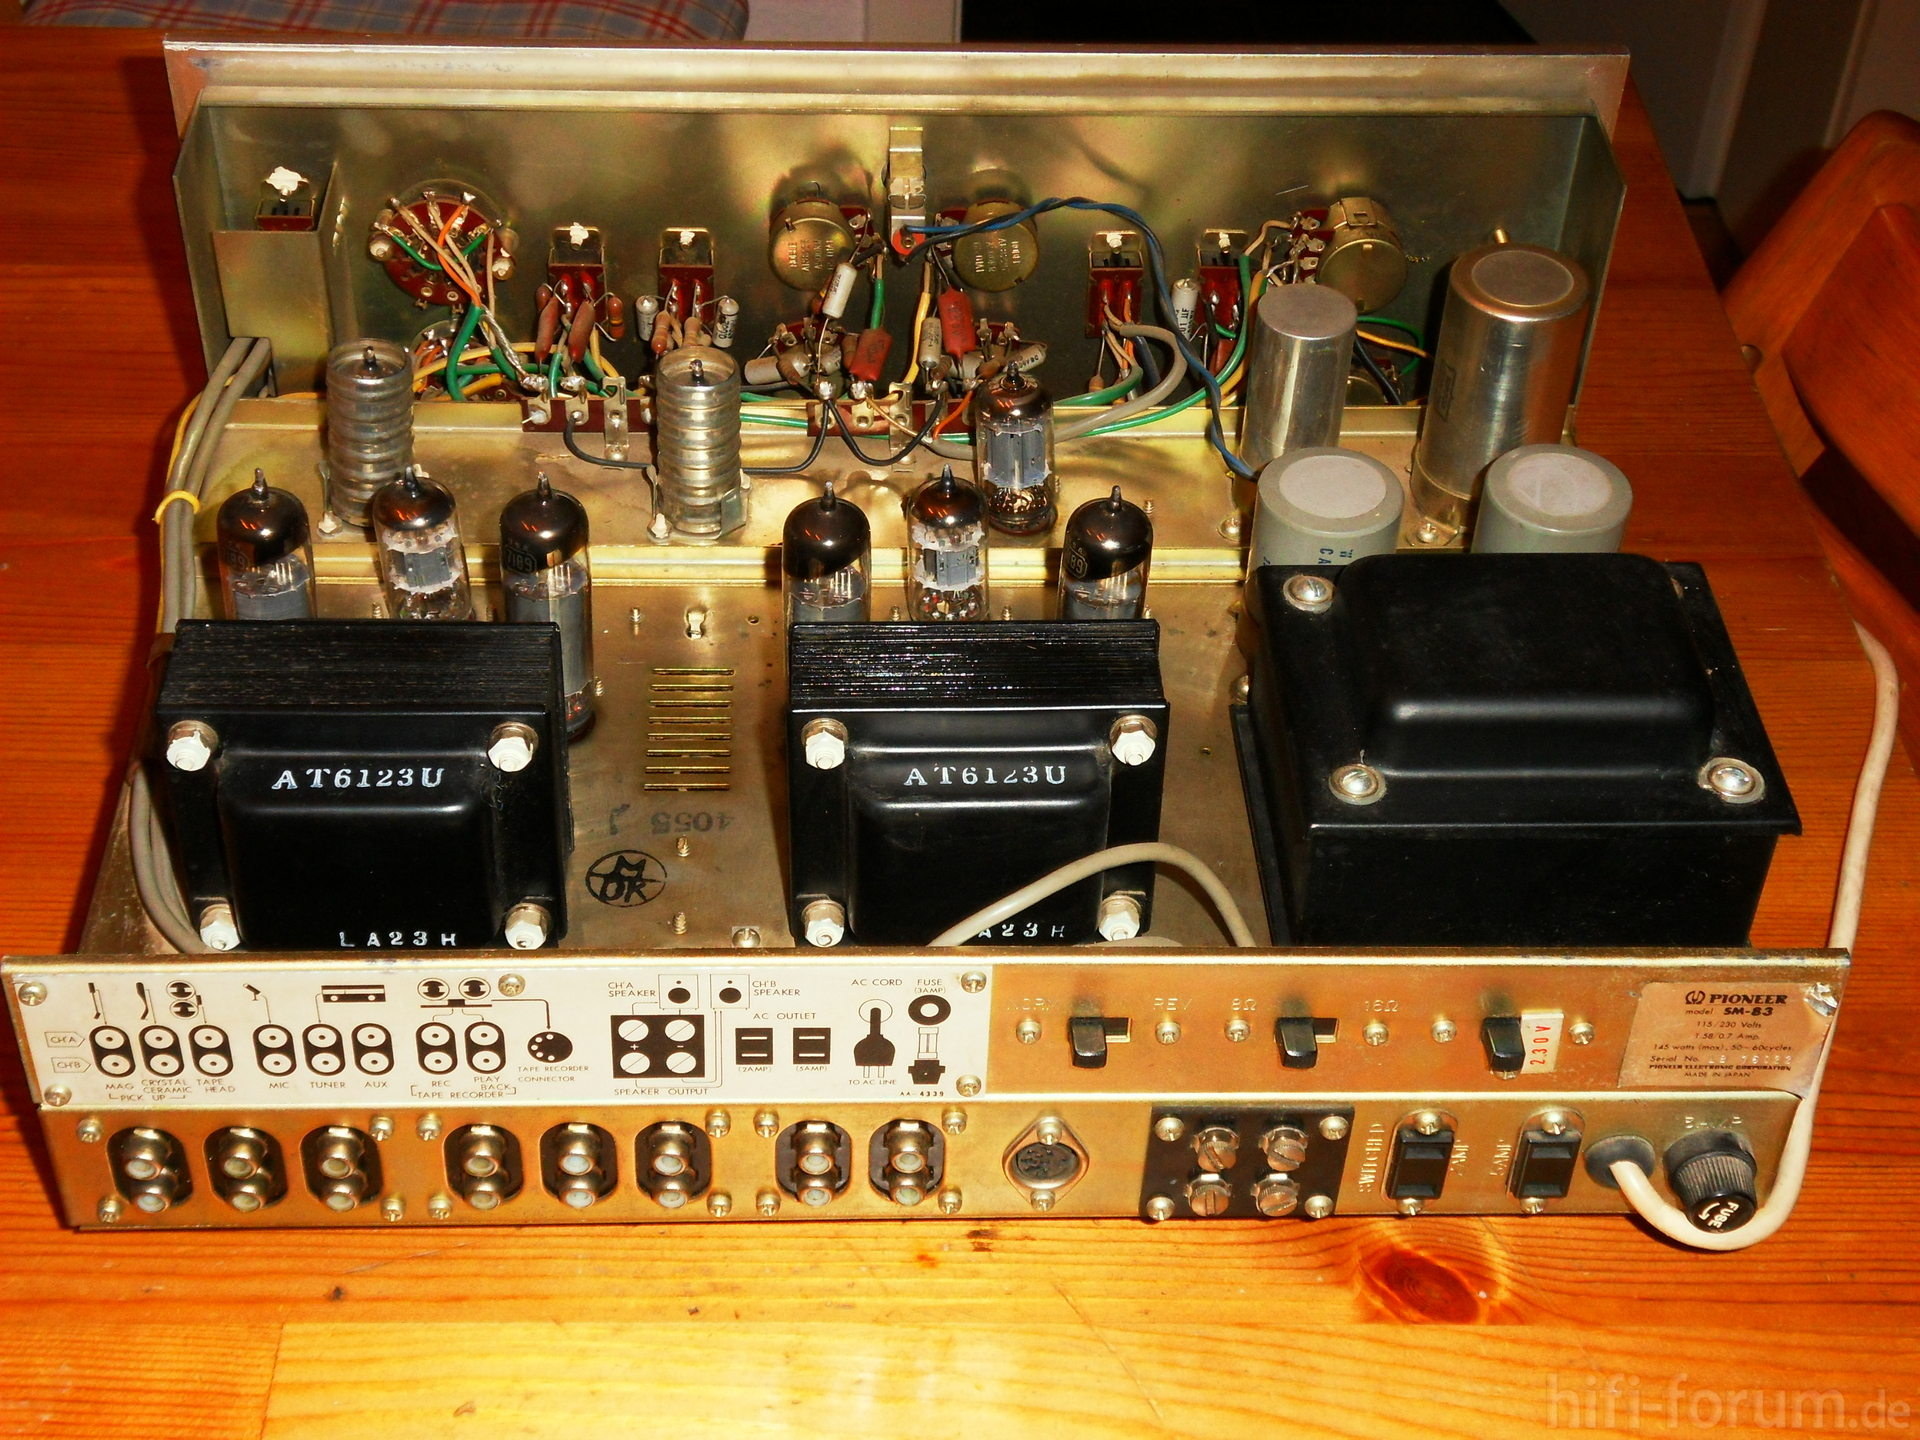 The Golden Age Pioneer-rohren-vollverstarker-sm-83_107868